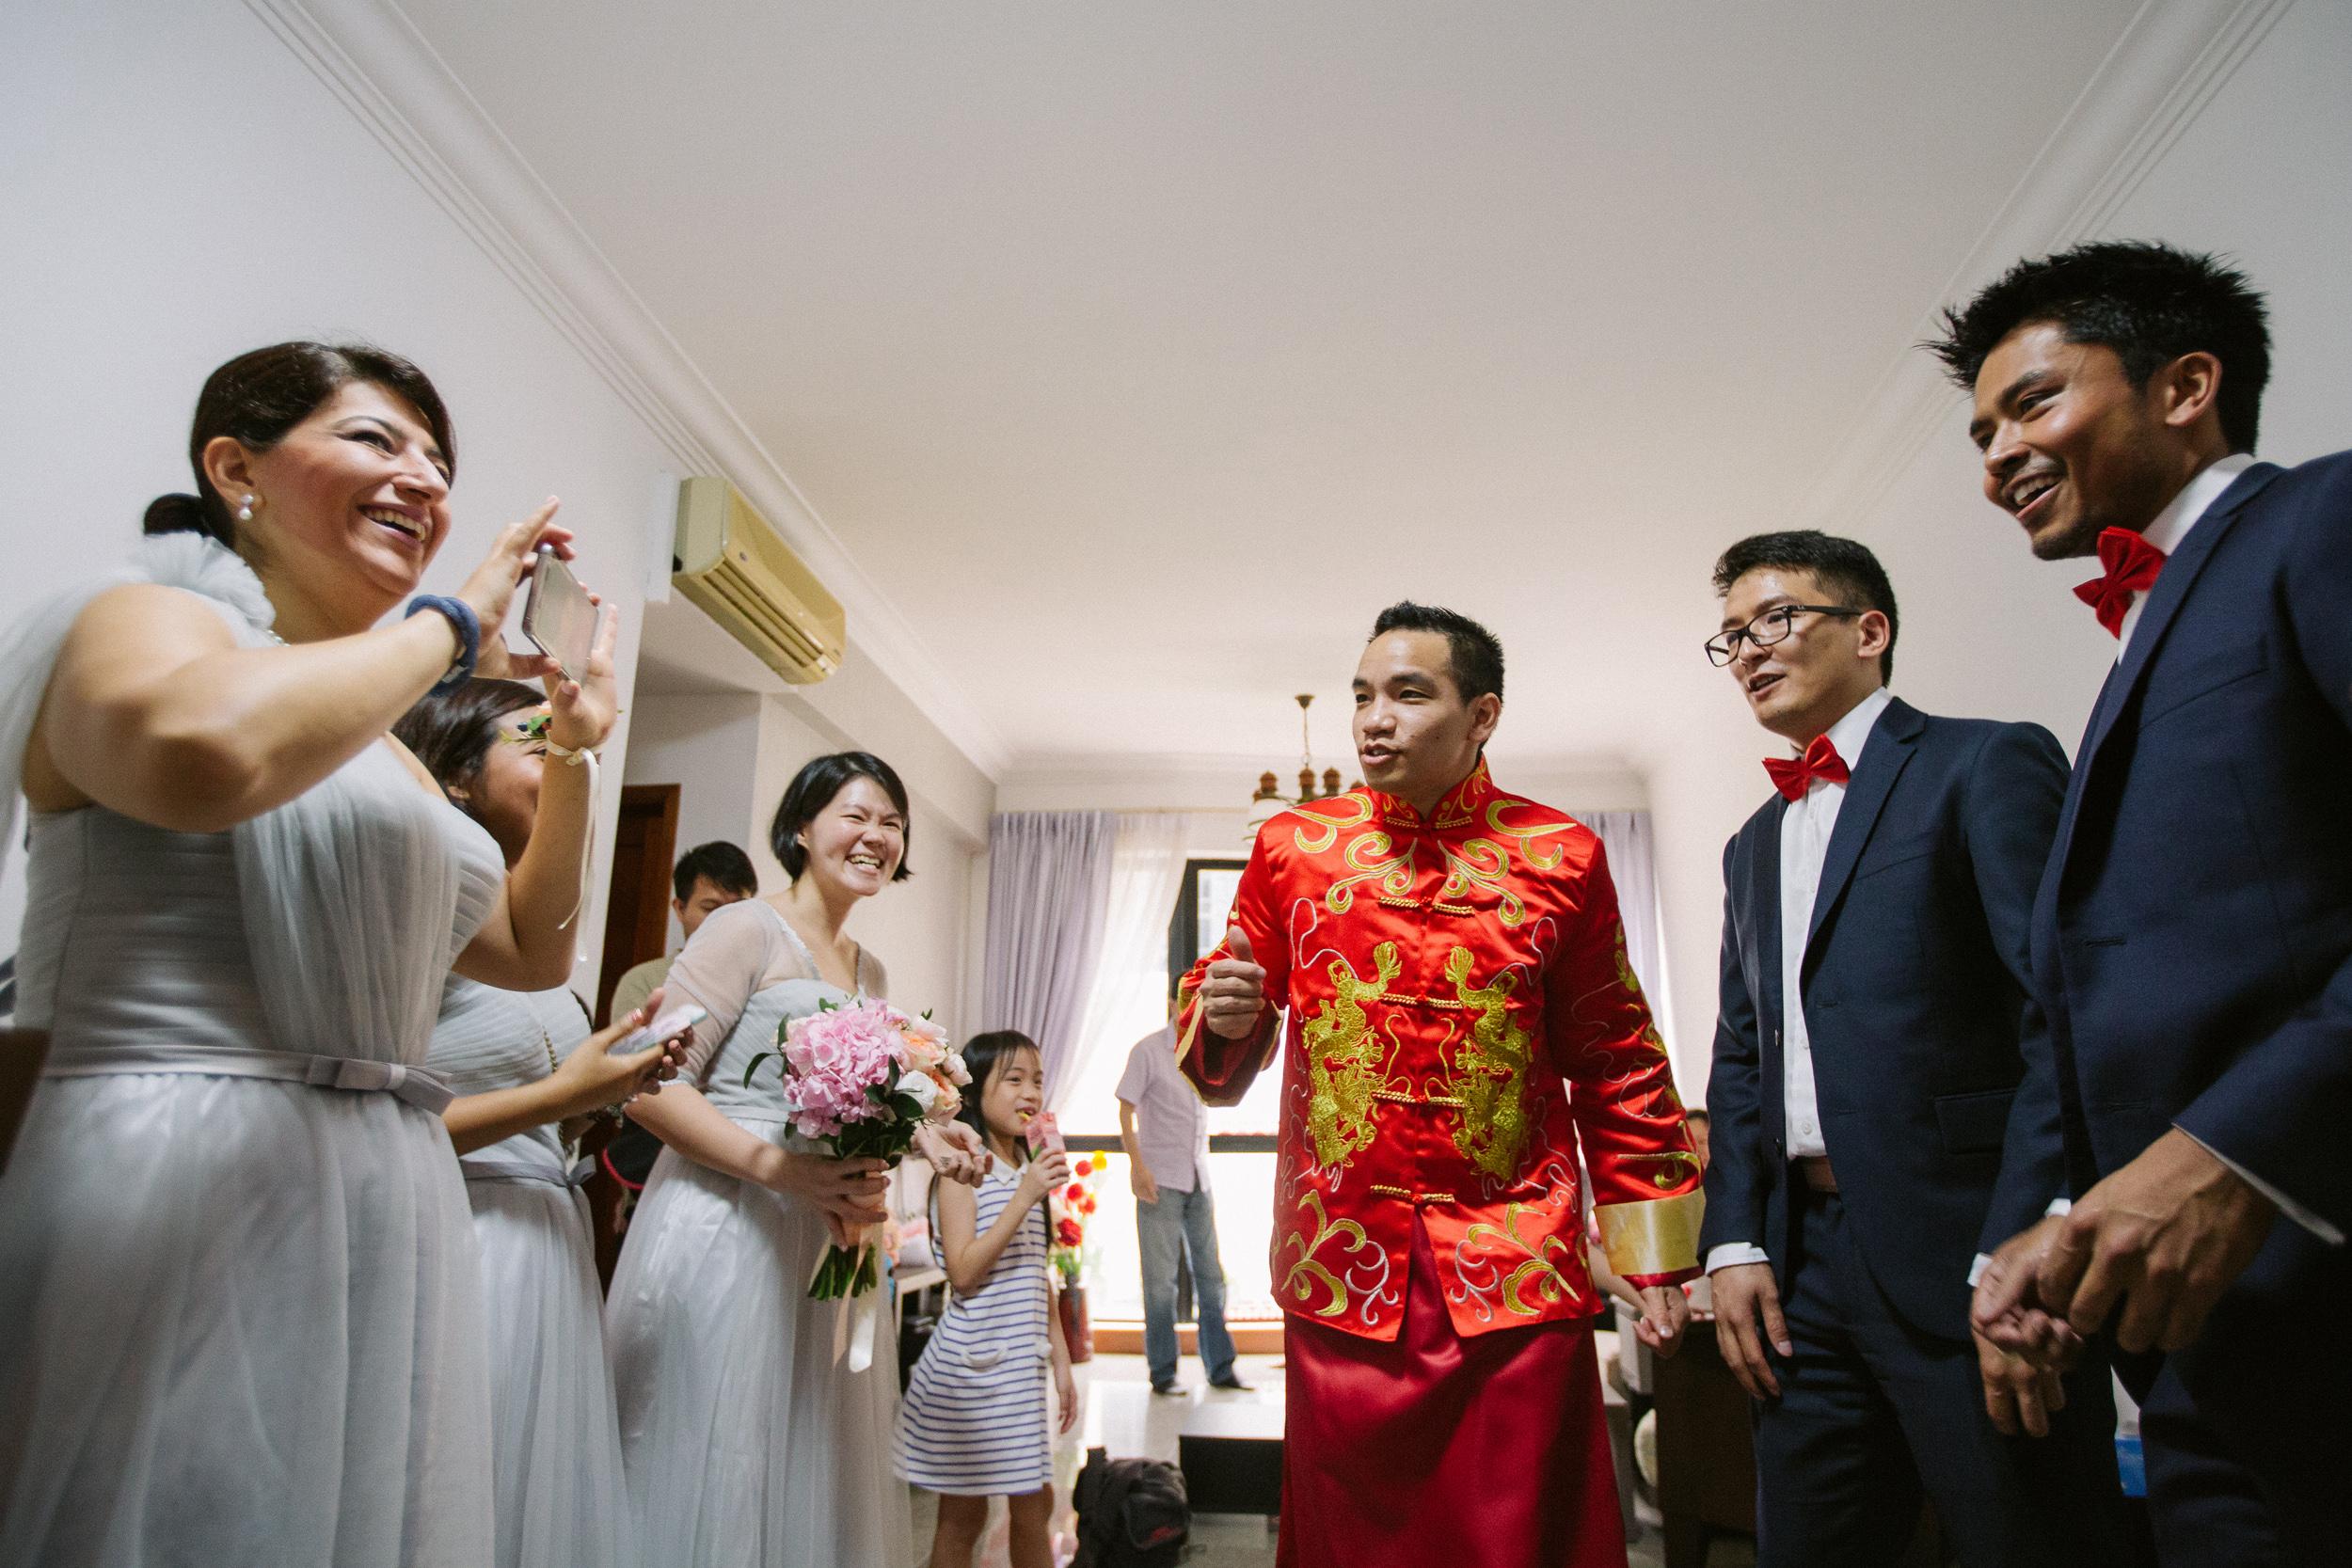 singapore-wedding-photographer-cheryl-matthew-fullerton-hotel-wedding-17.jpg